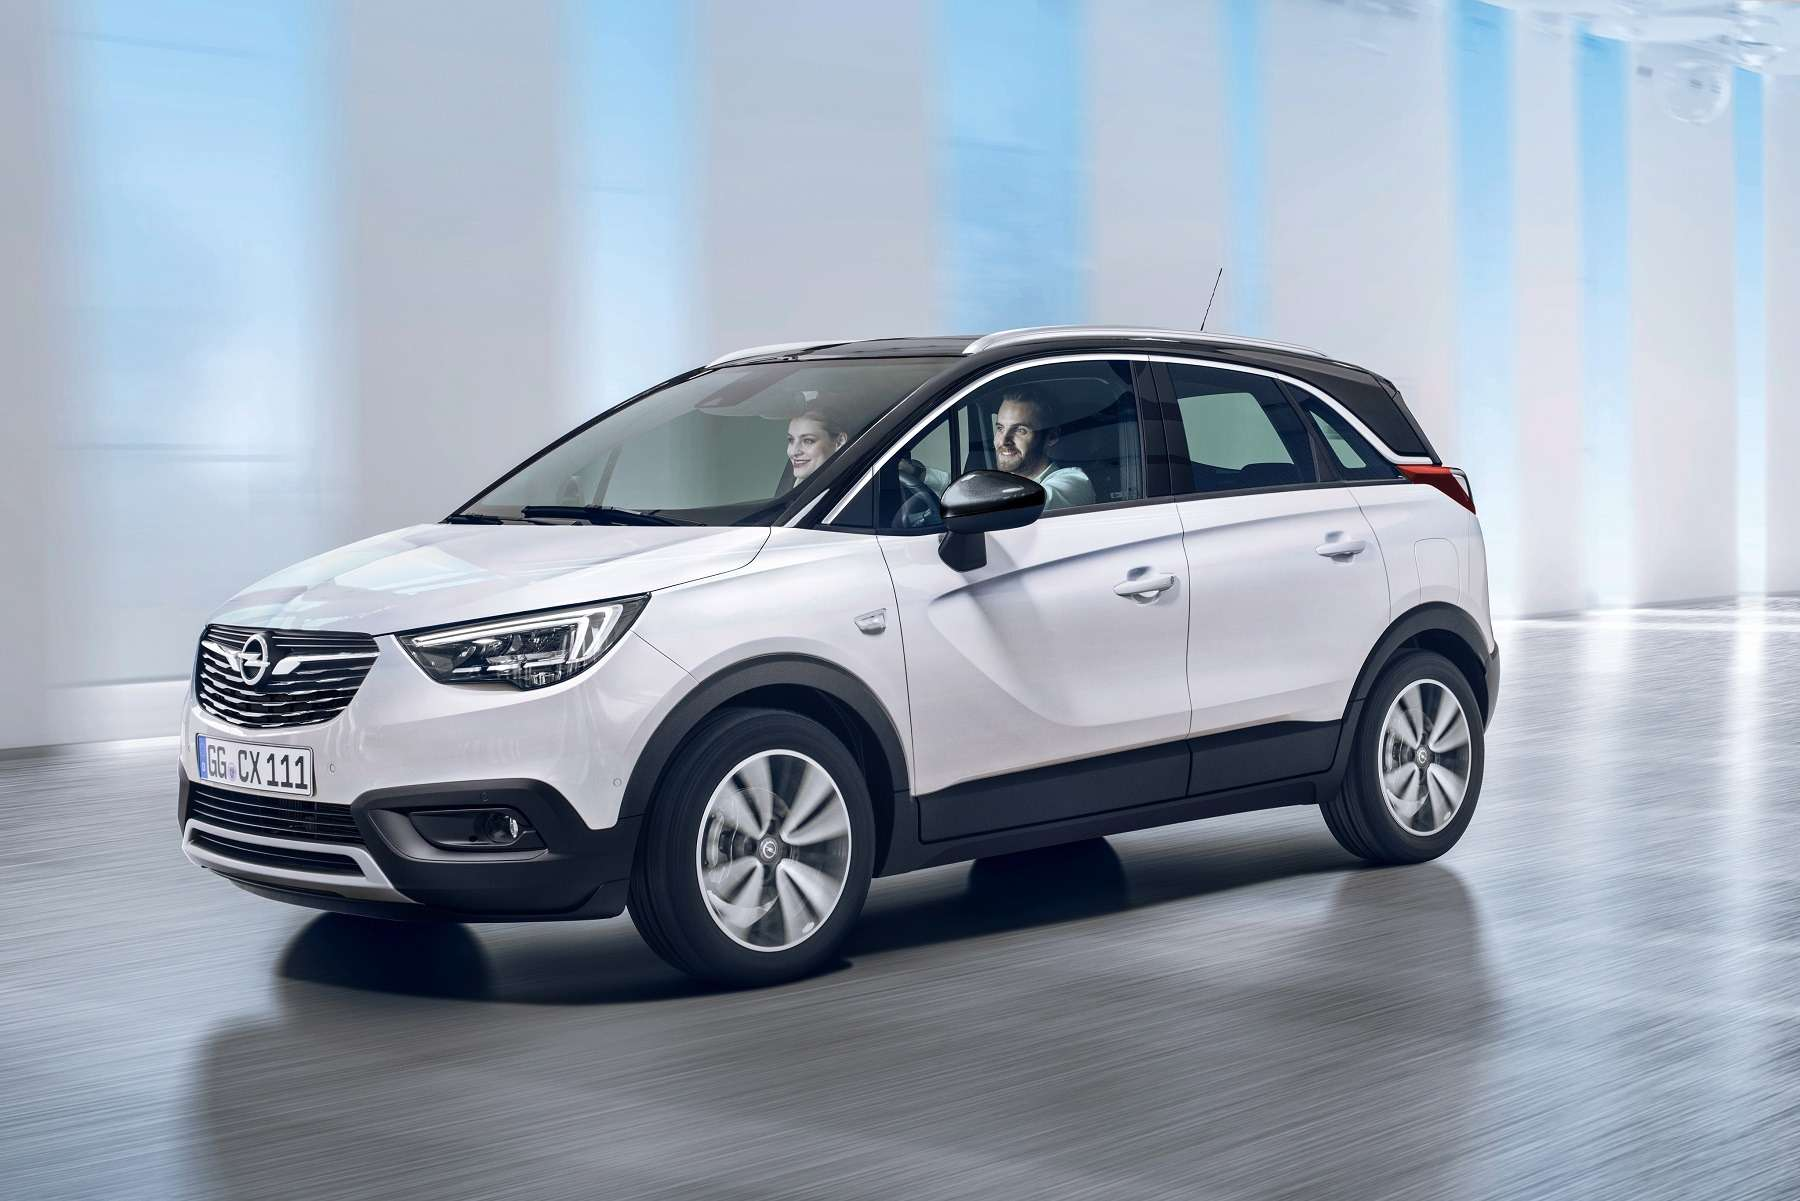 Кроссовер Opel Crossland Xпредставлен официально— фото 694501